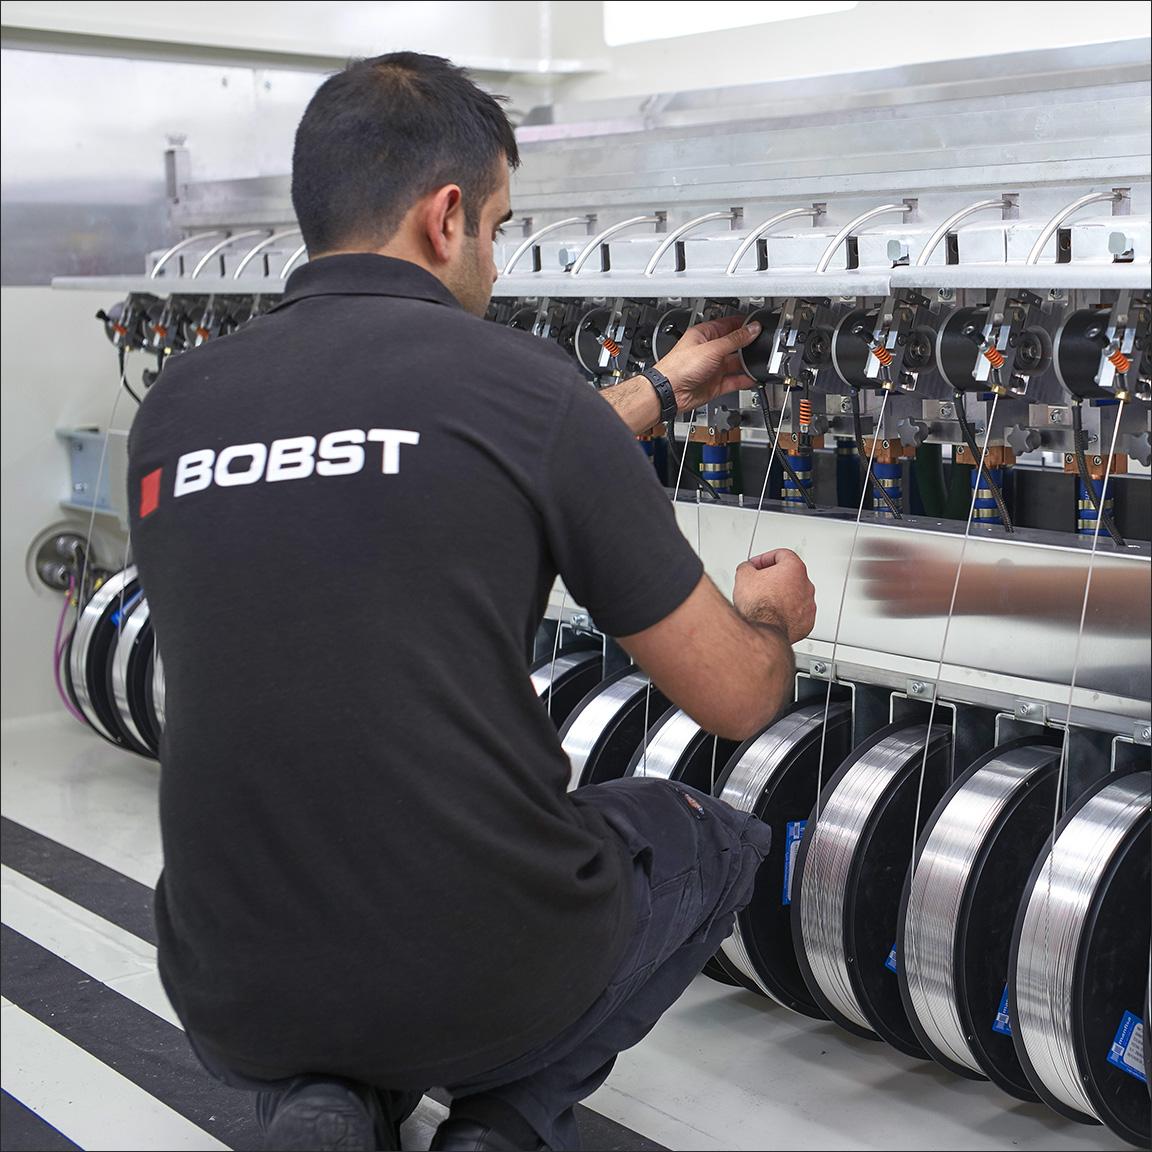 Bobst-L1000076-MP35Cron.jpg